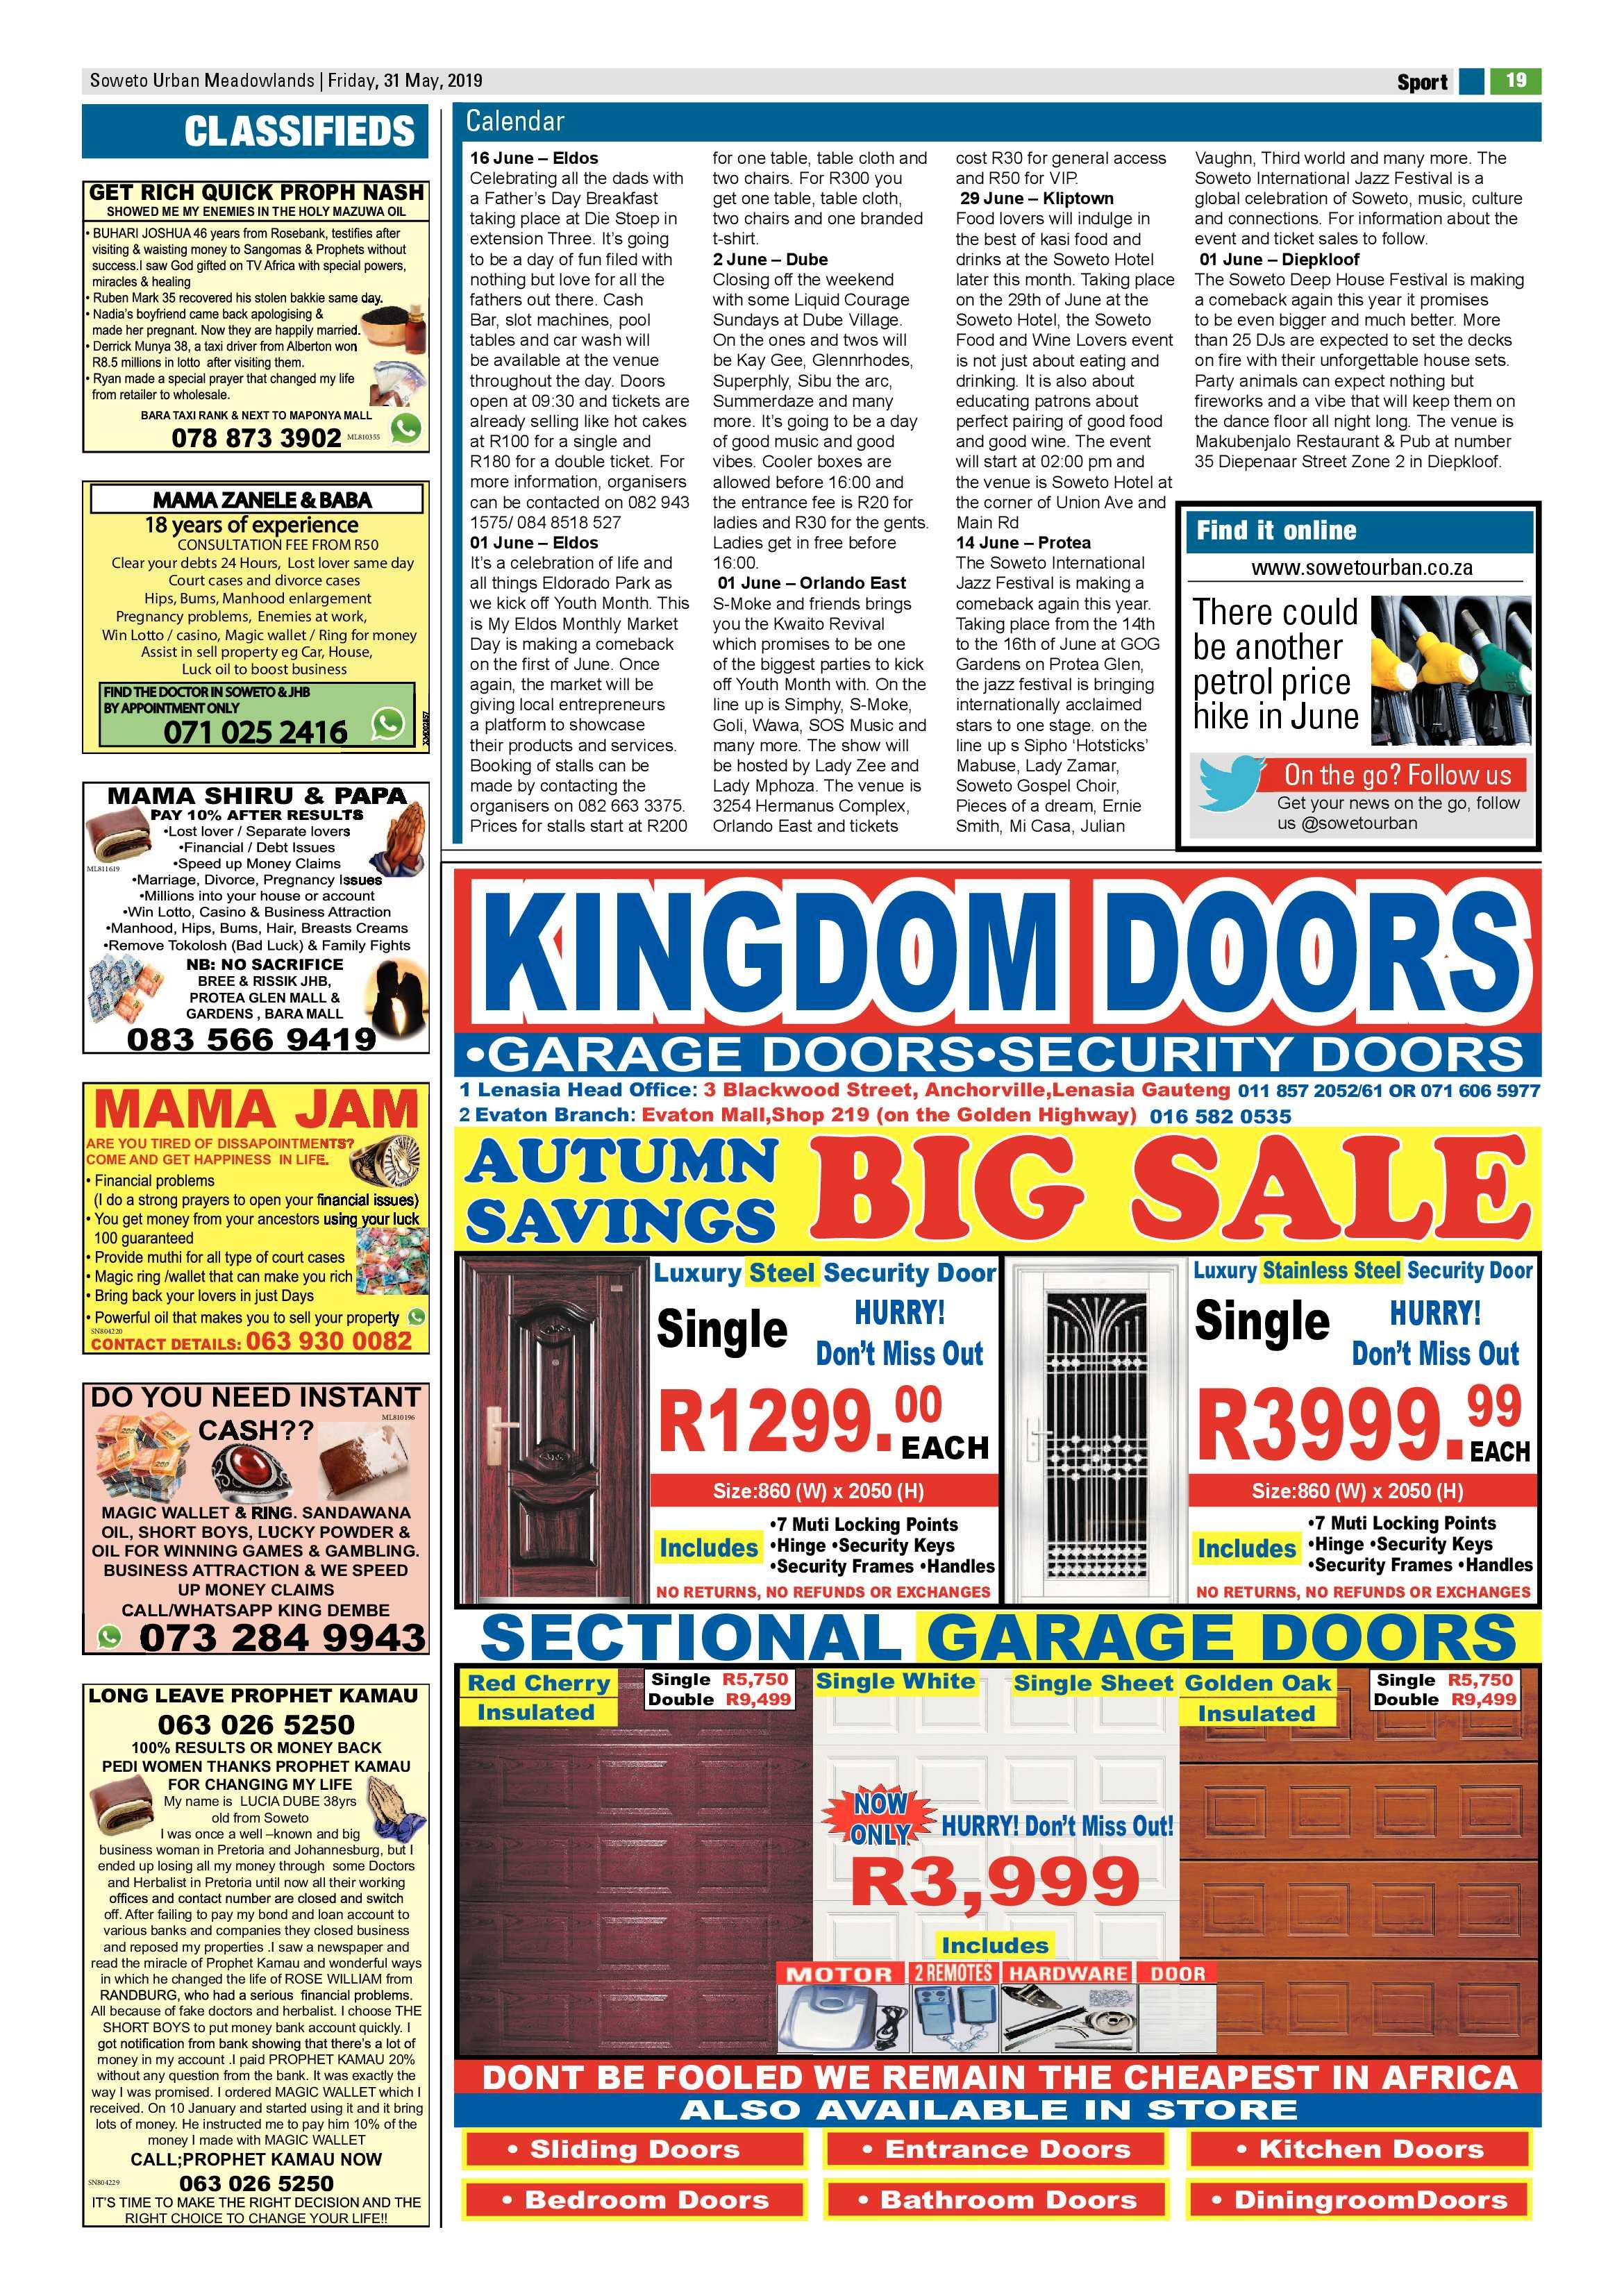 Meadowlands News – May 31, 2019 | Soweto Urban